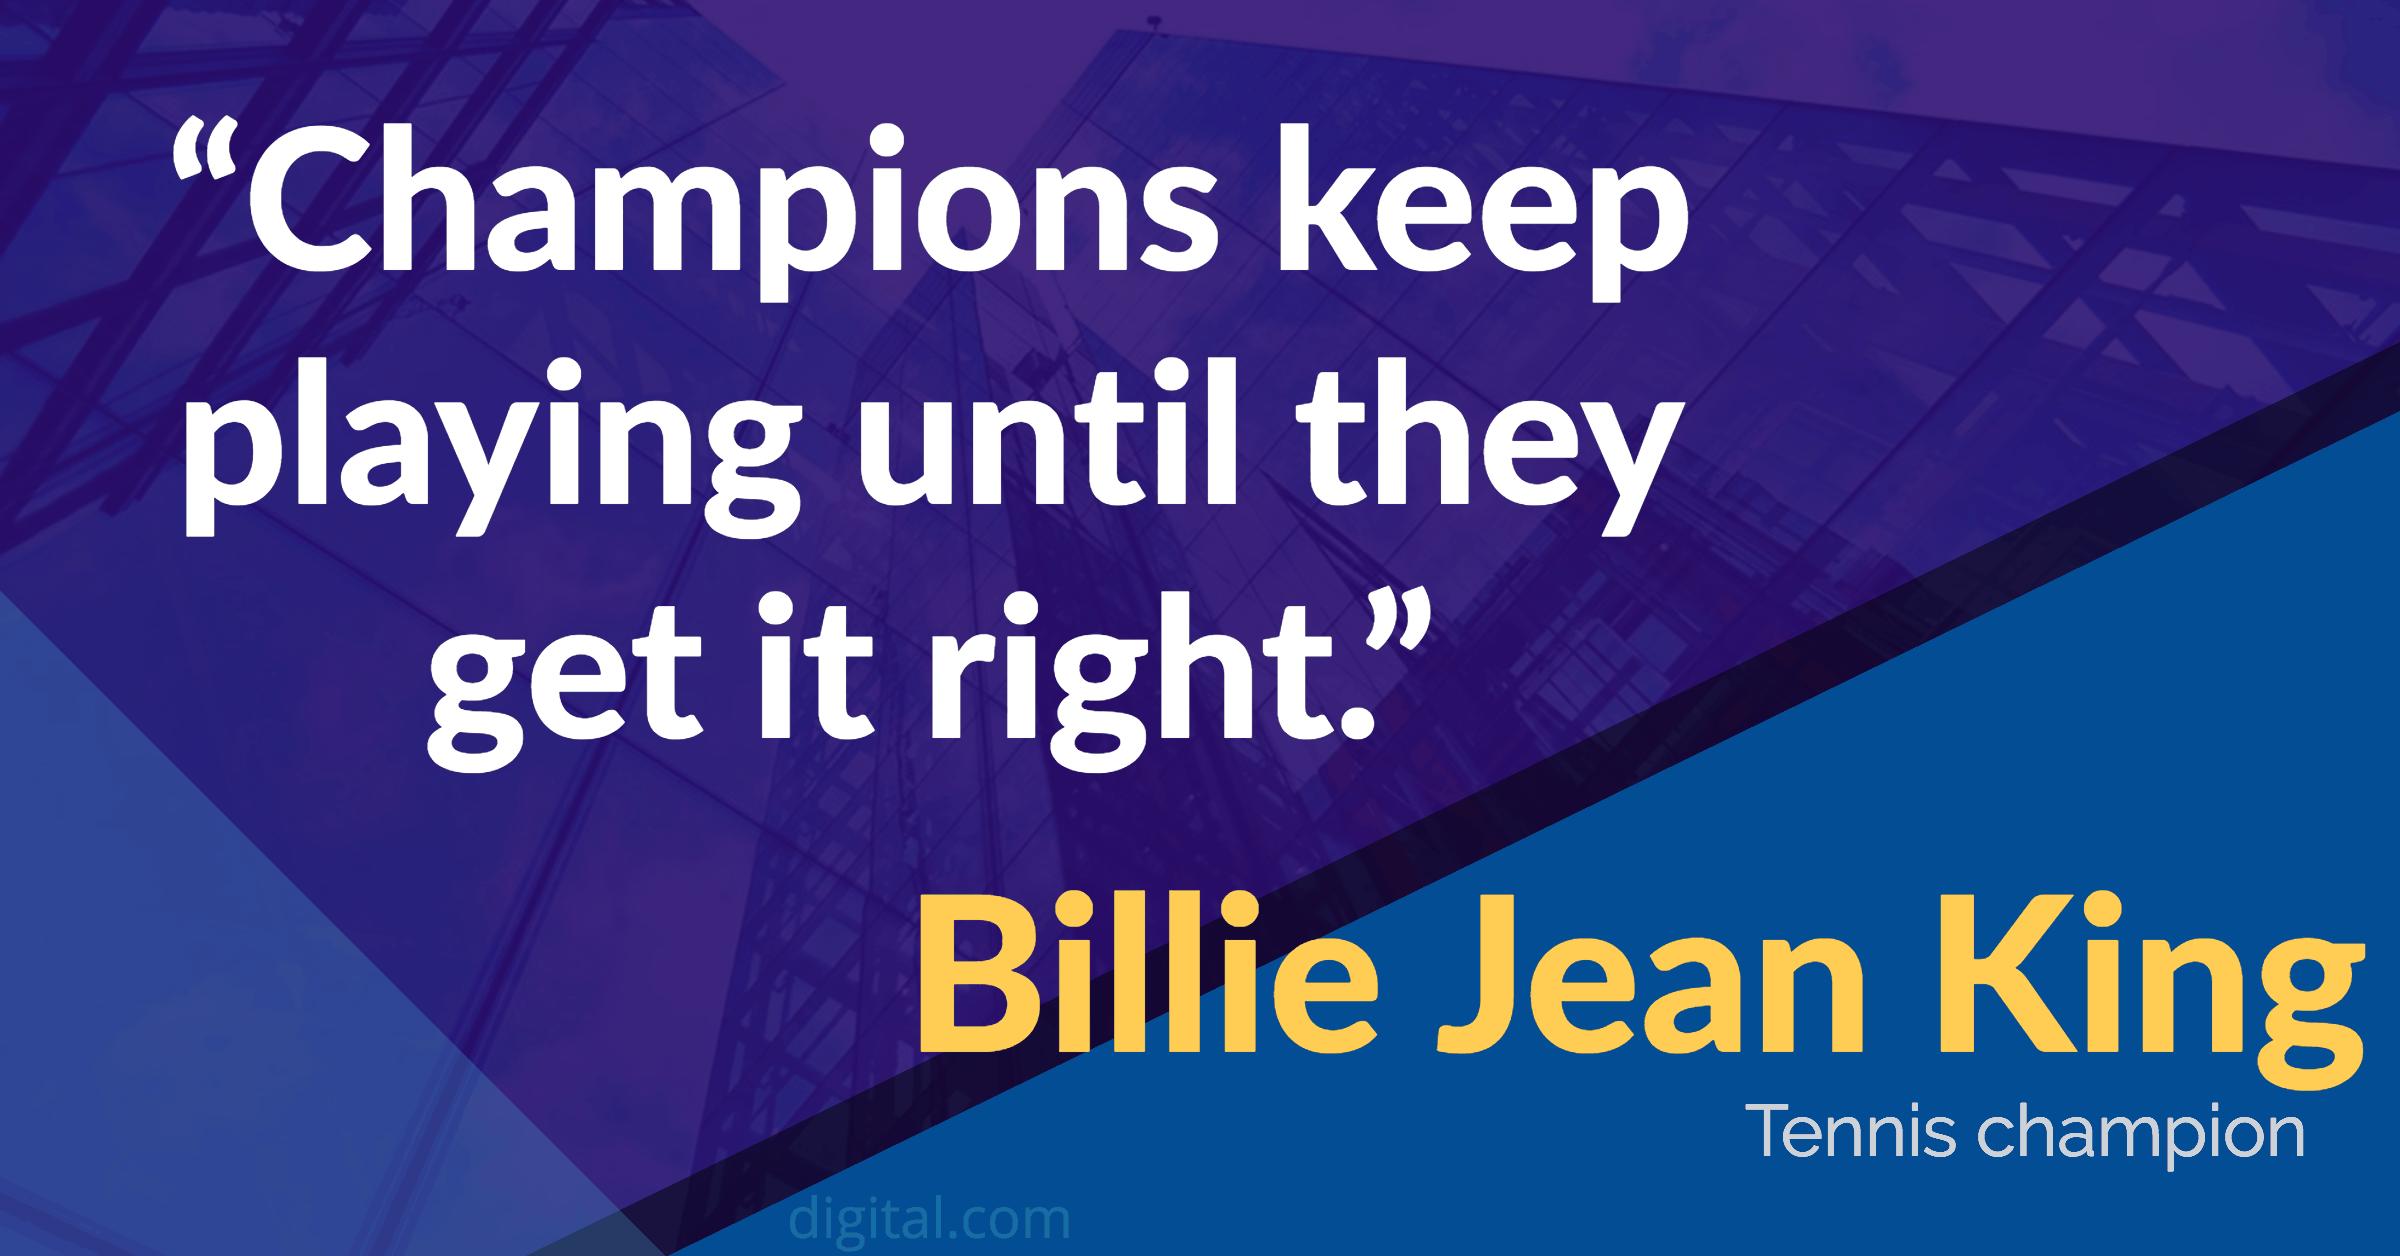 billie jean king leadership quote